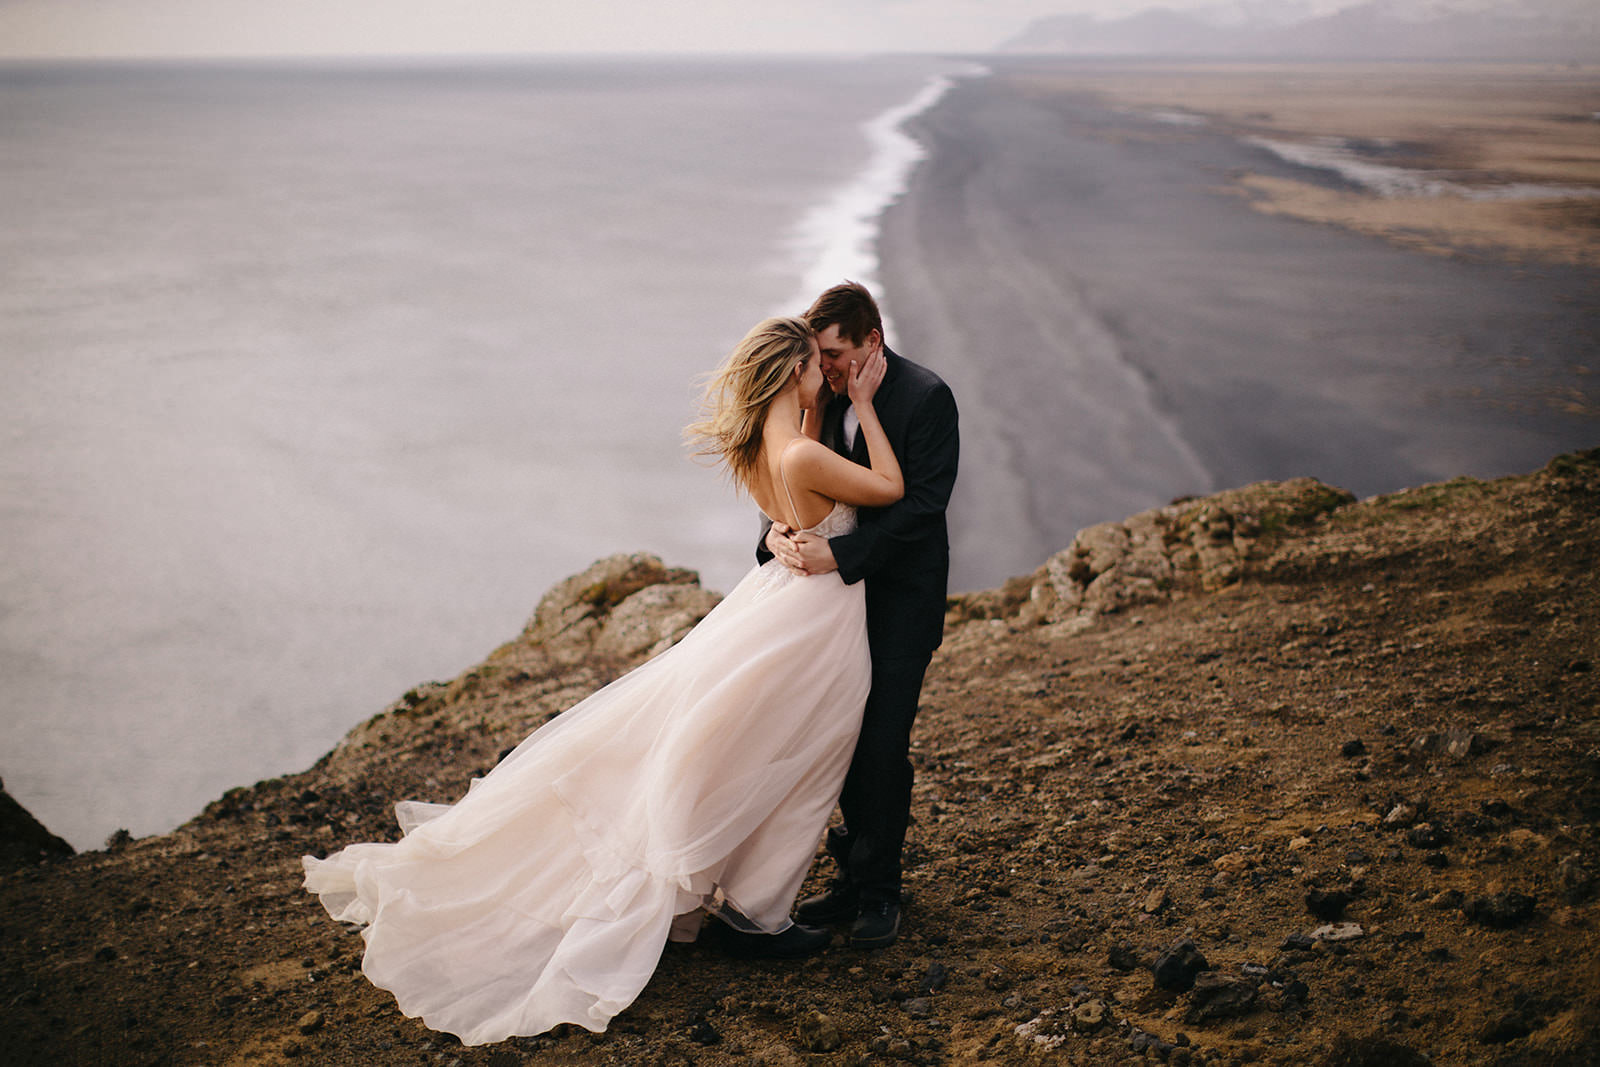 Icelandic Iceland Elopement Wedding Elope Photographer Eloping Reykjavík Vik Black Sand Beach Jökulsárlón Skogafoss Waterfall Vestrahorn Mountain Liz Osban Photography Destination 83.jpg